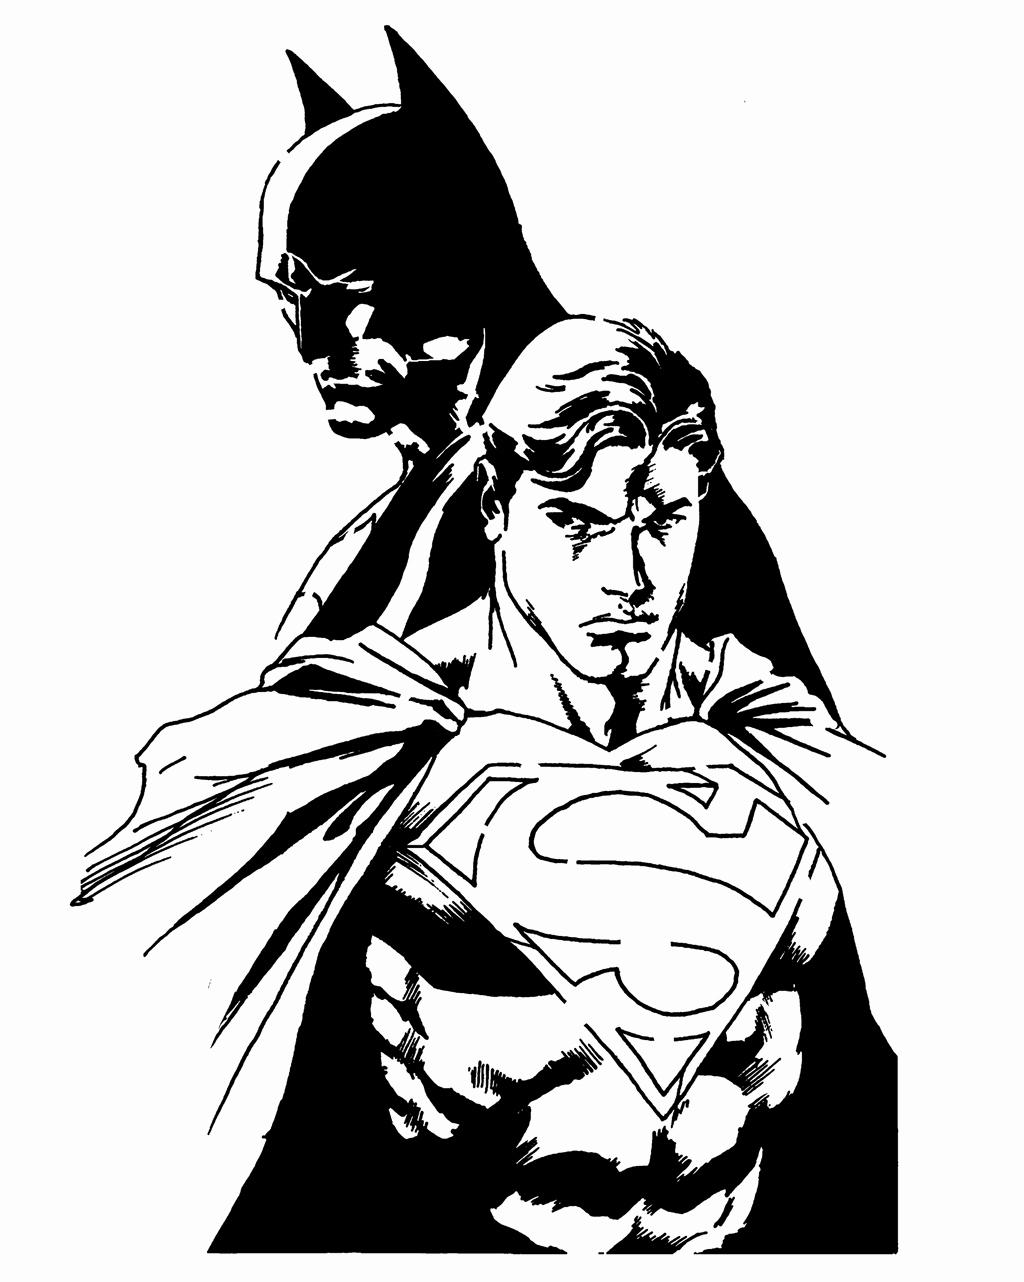 Batman Stencil Art Lovely Superman and Batman Stencil by Joedson On Deviantart